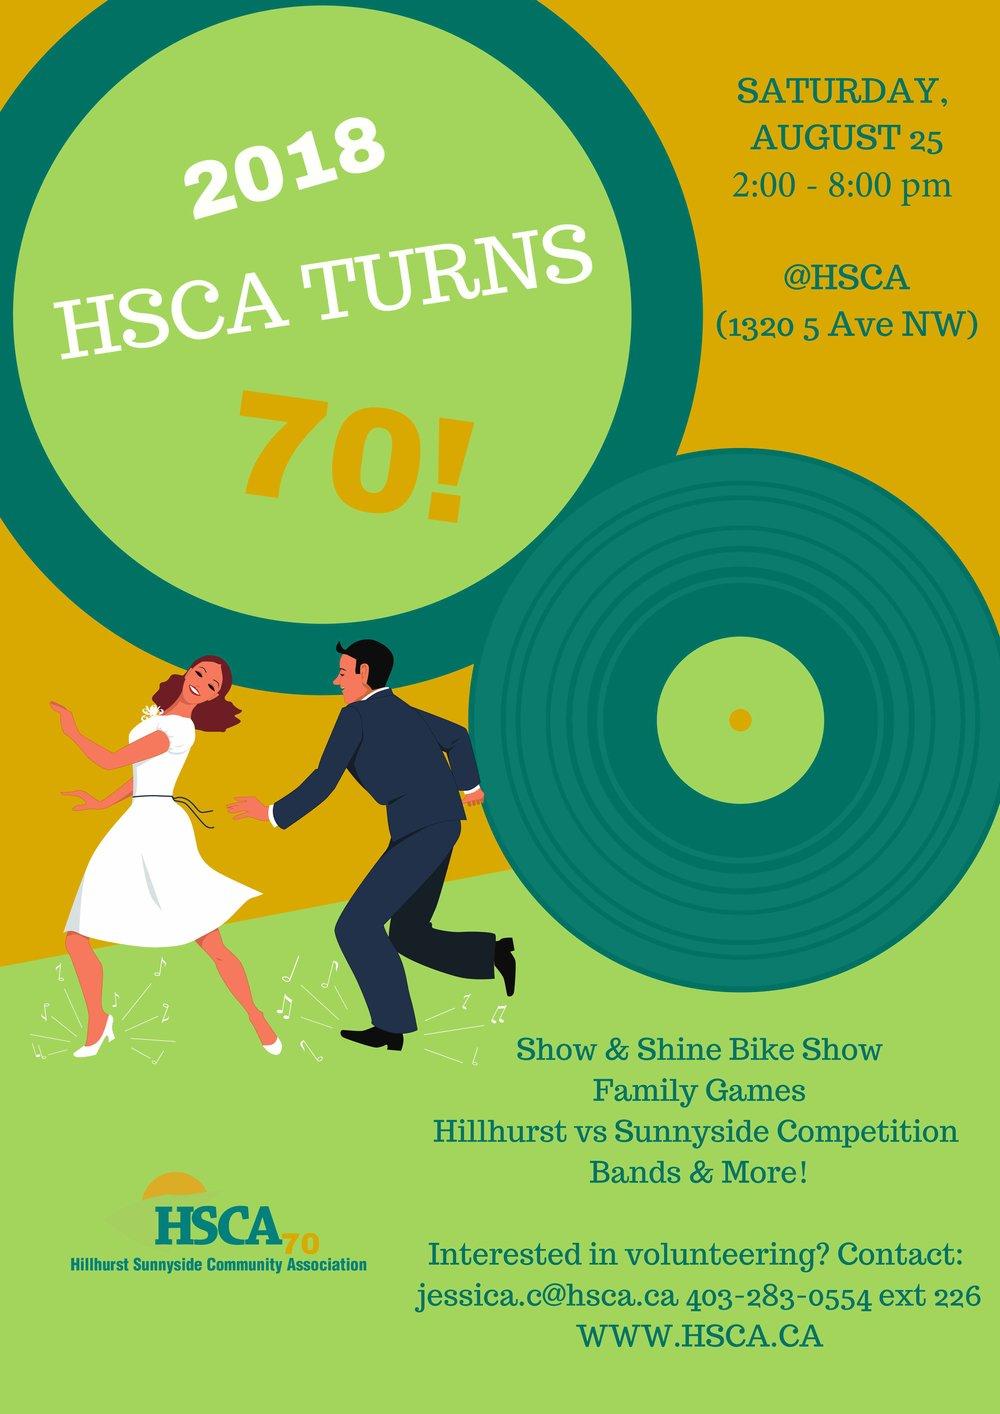 HSCA's 70th Anniversary copy.jpg